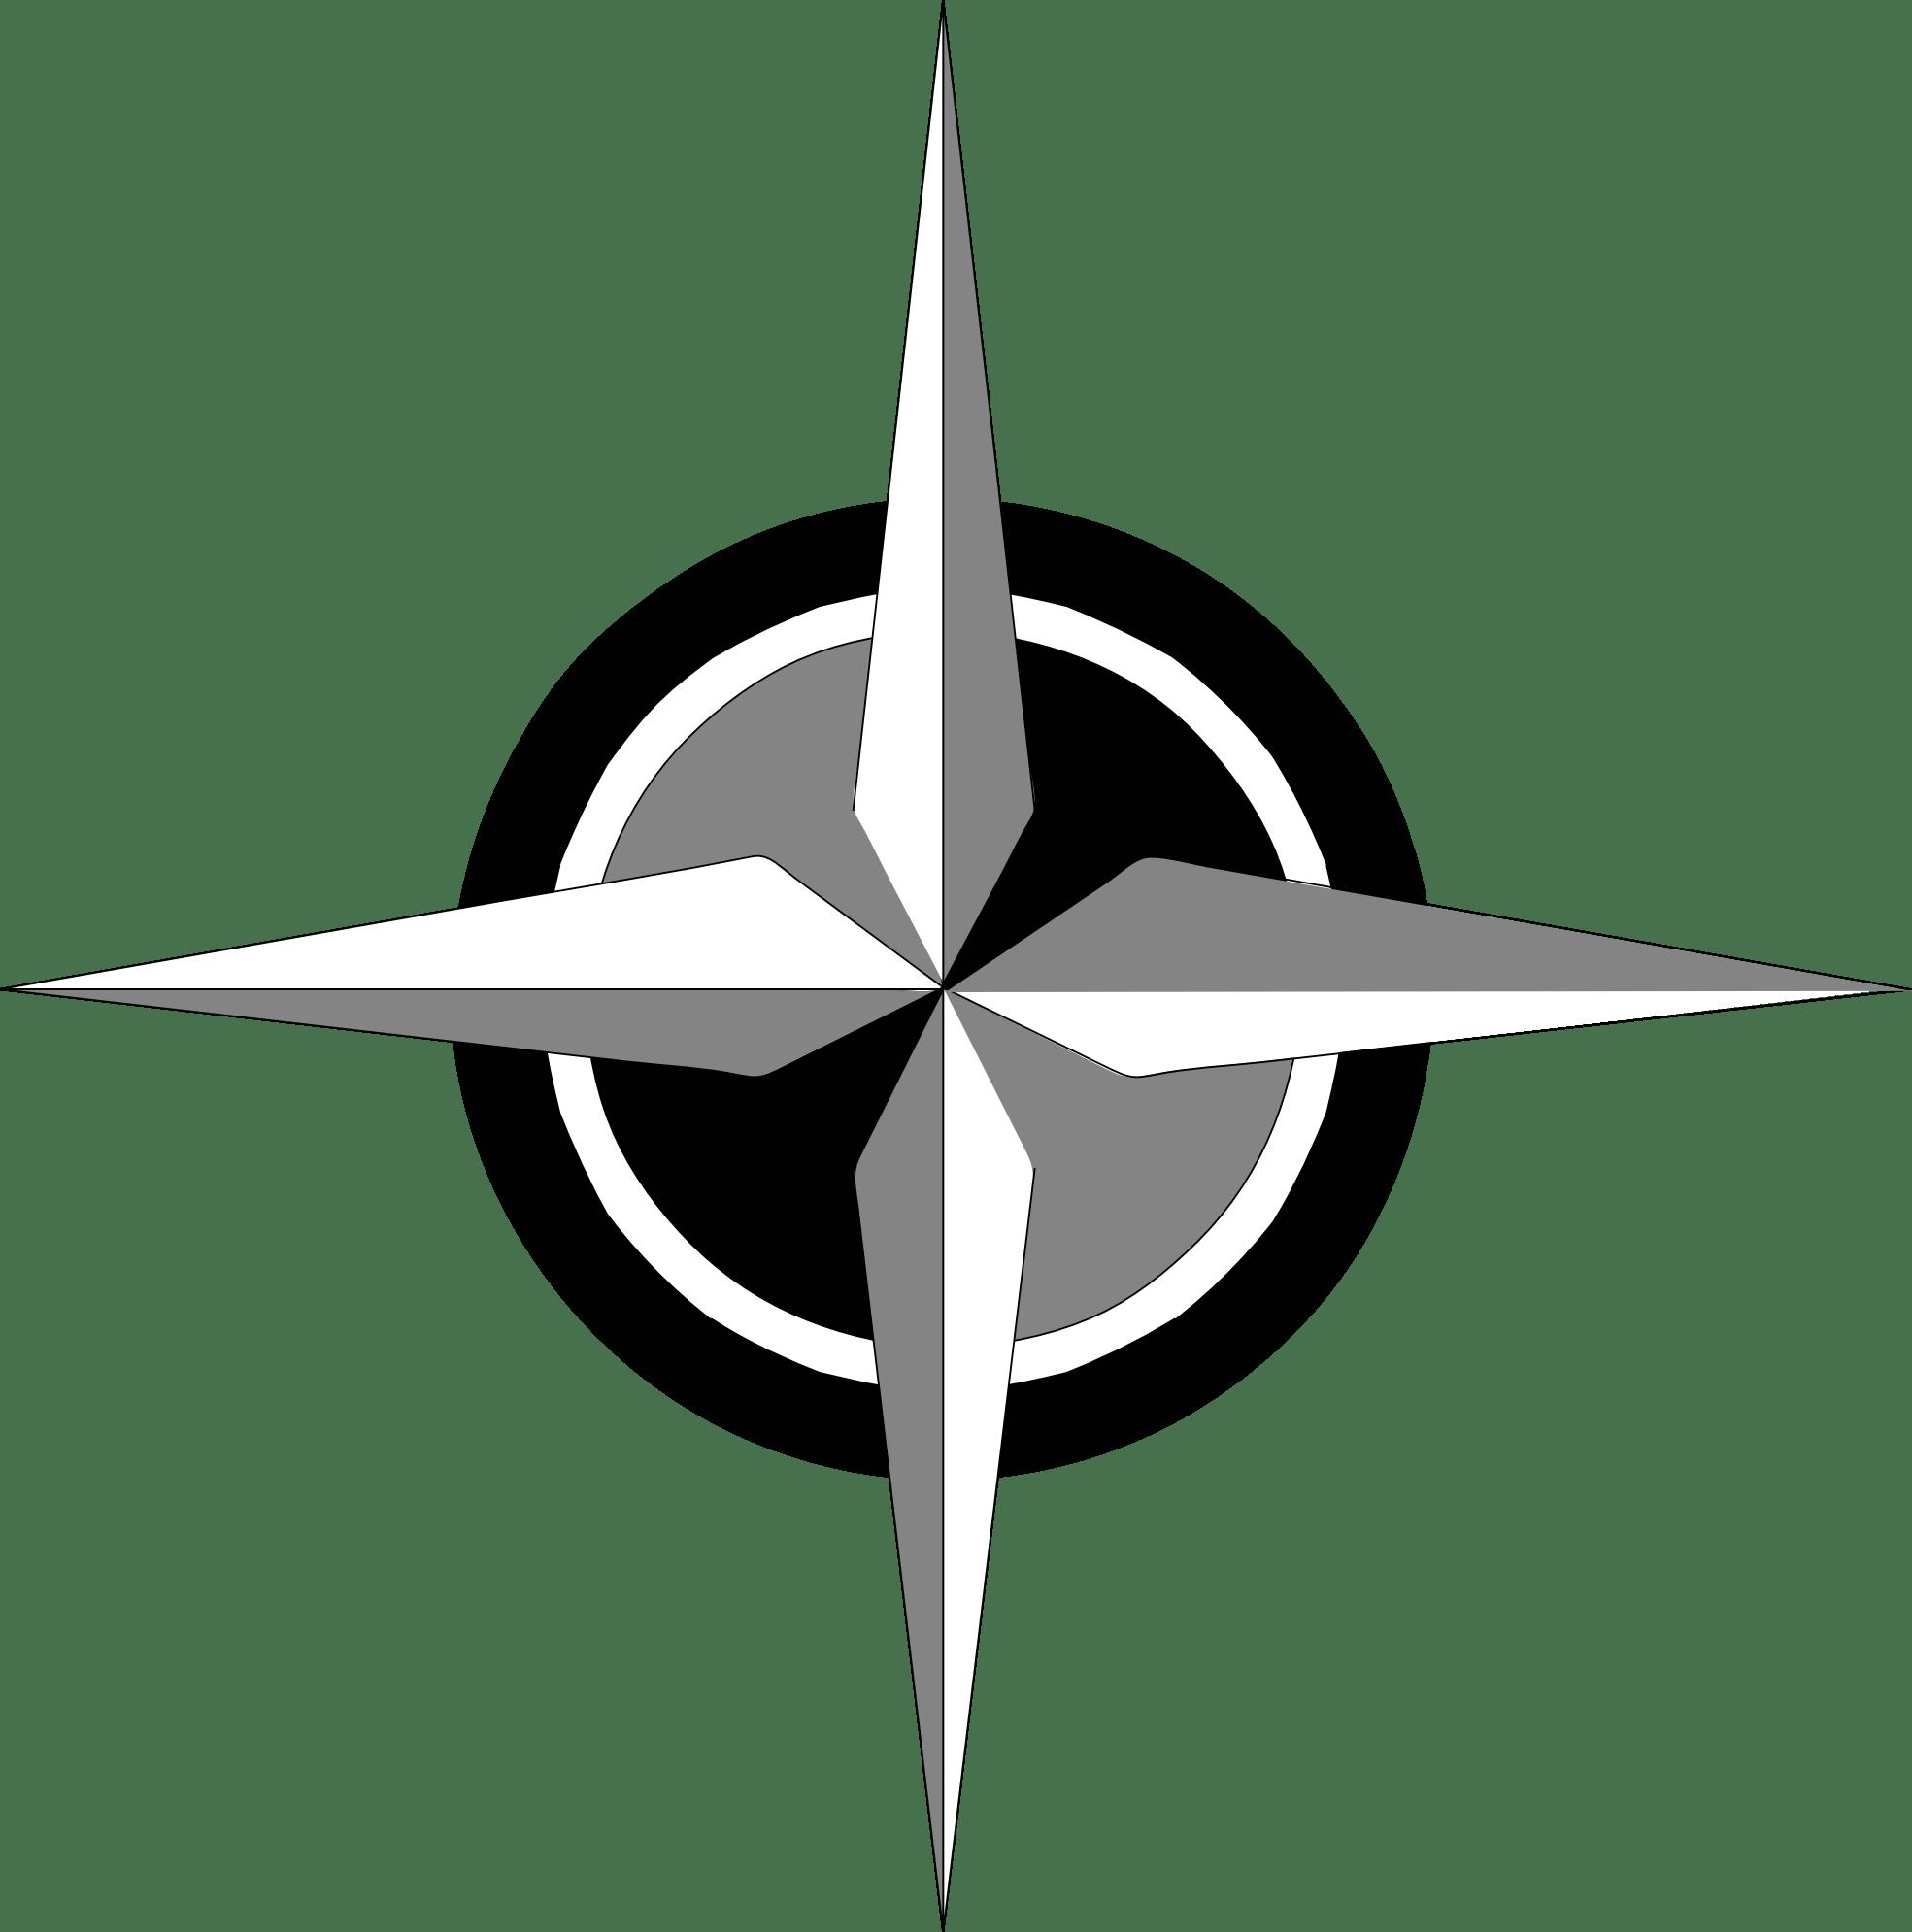 Compass Rose Svg